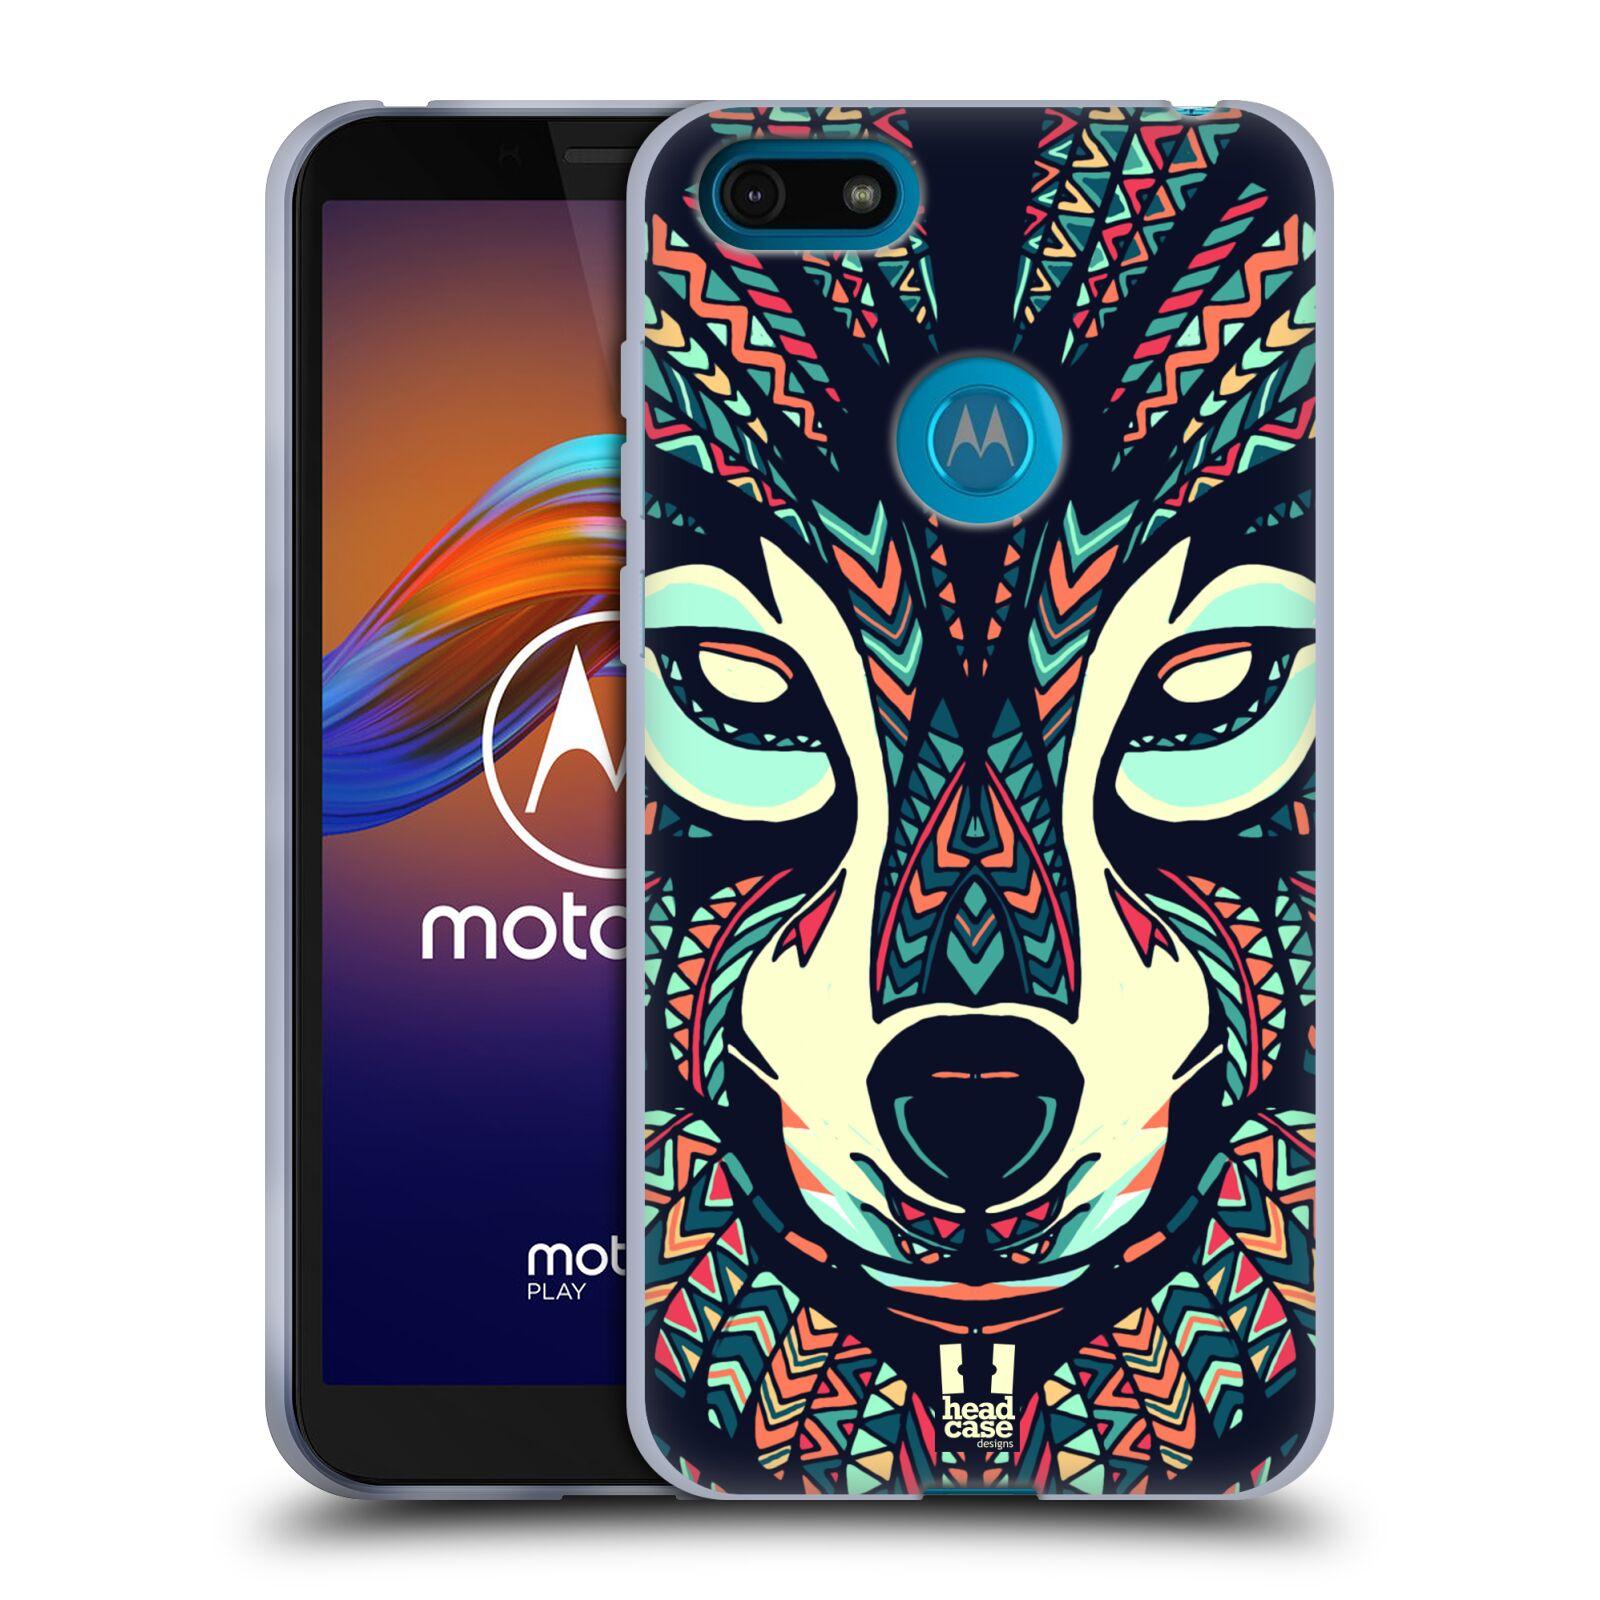 Silikonové pouzdro na mobil Motorola Moto E6 Play - Head Case - AZTEC VLK